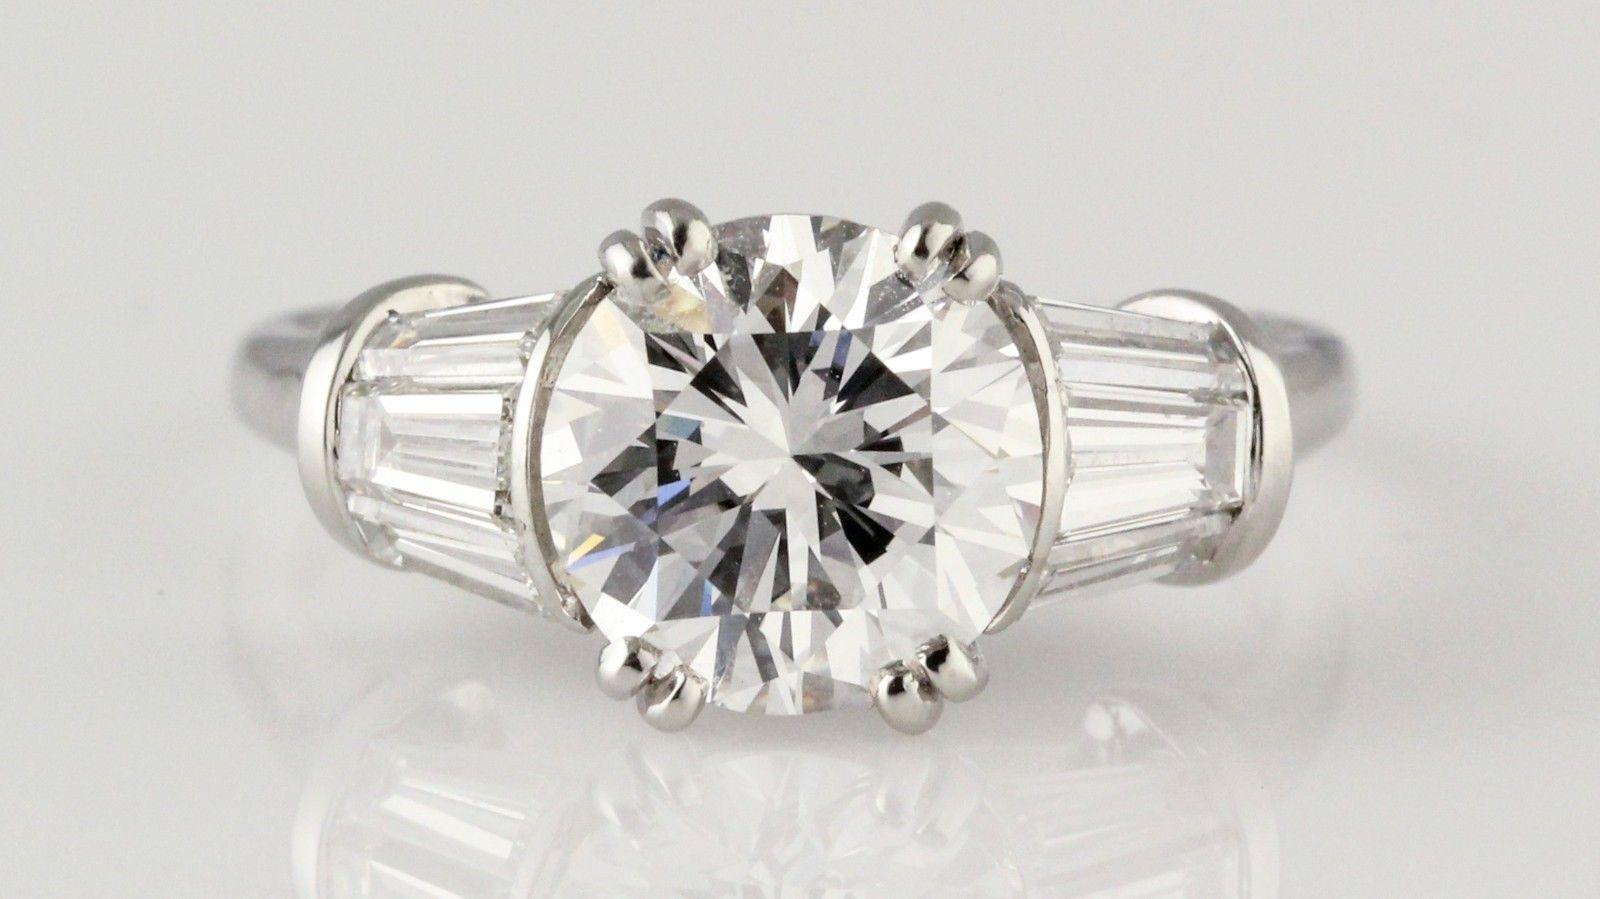 HARRY WINSTON 2.02 Carat E color VS1 Round Diamond and Platinum Engagement Ring